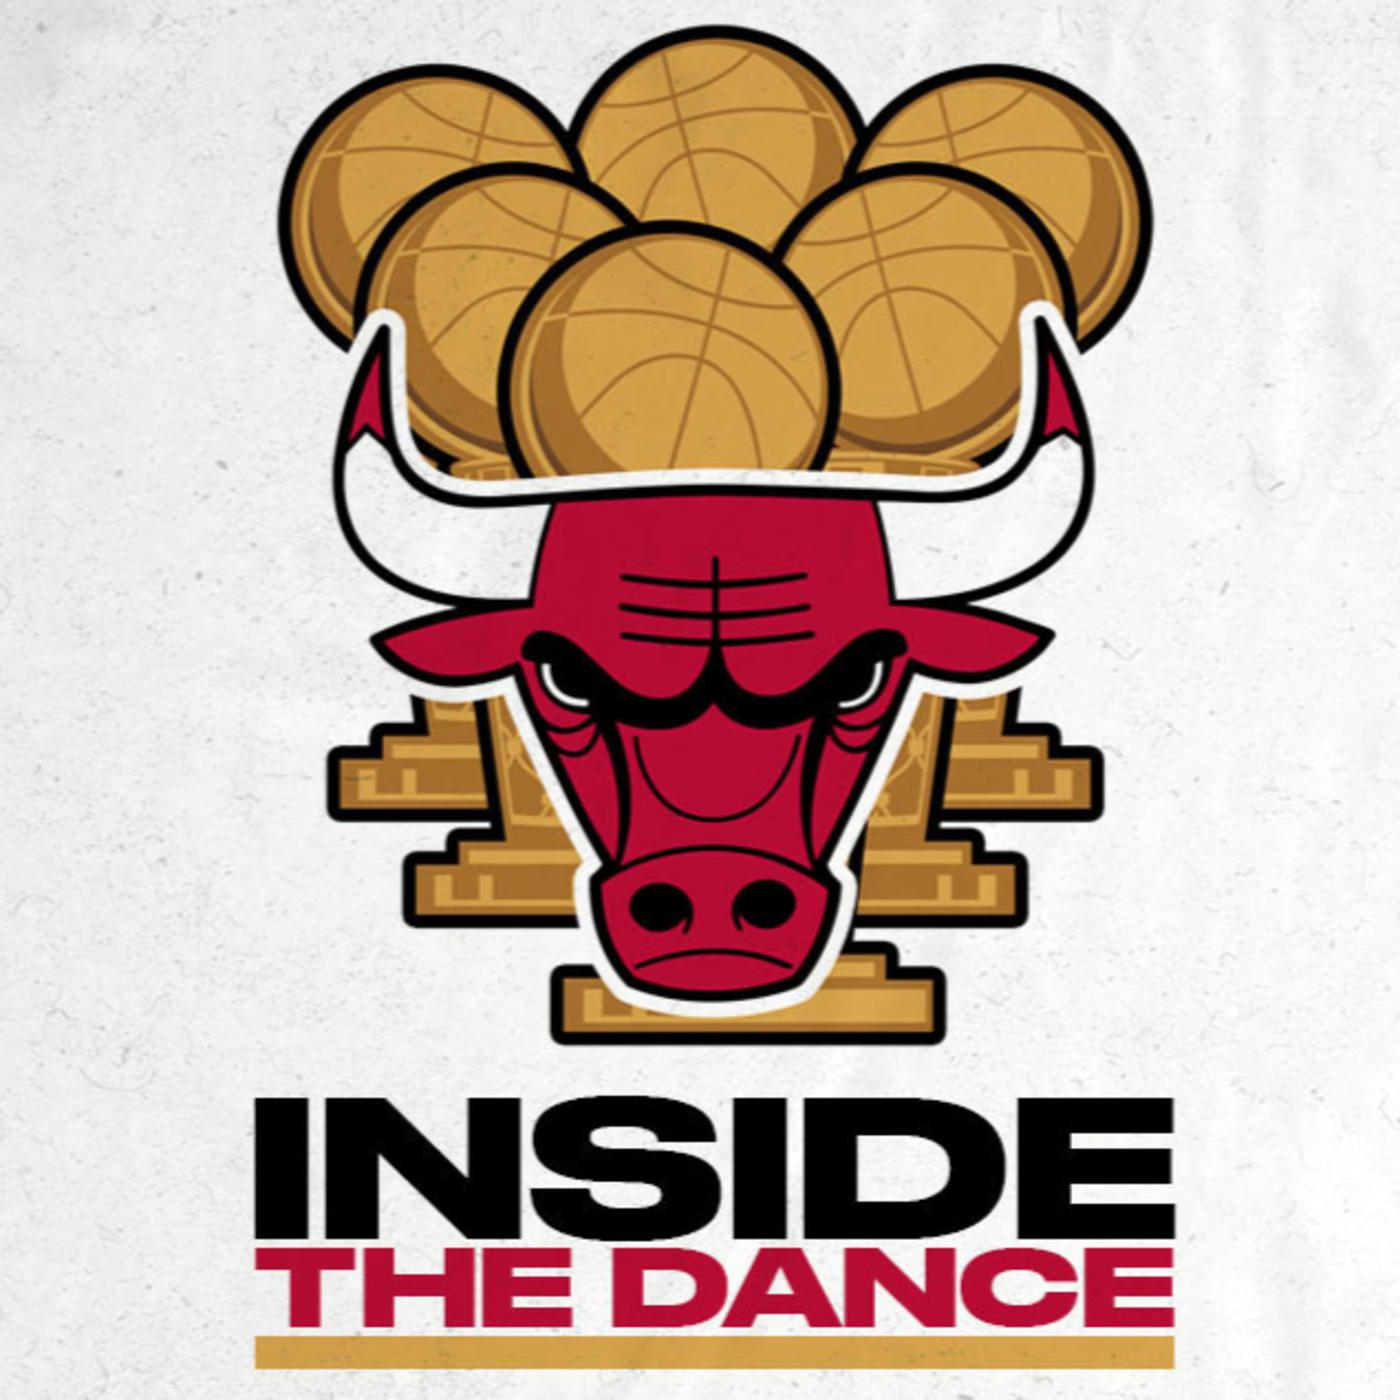 Chicago bulls christmas day jerseys